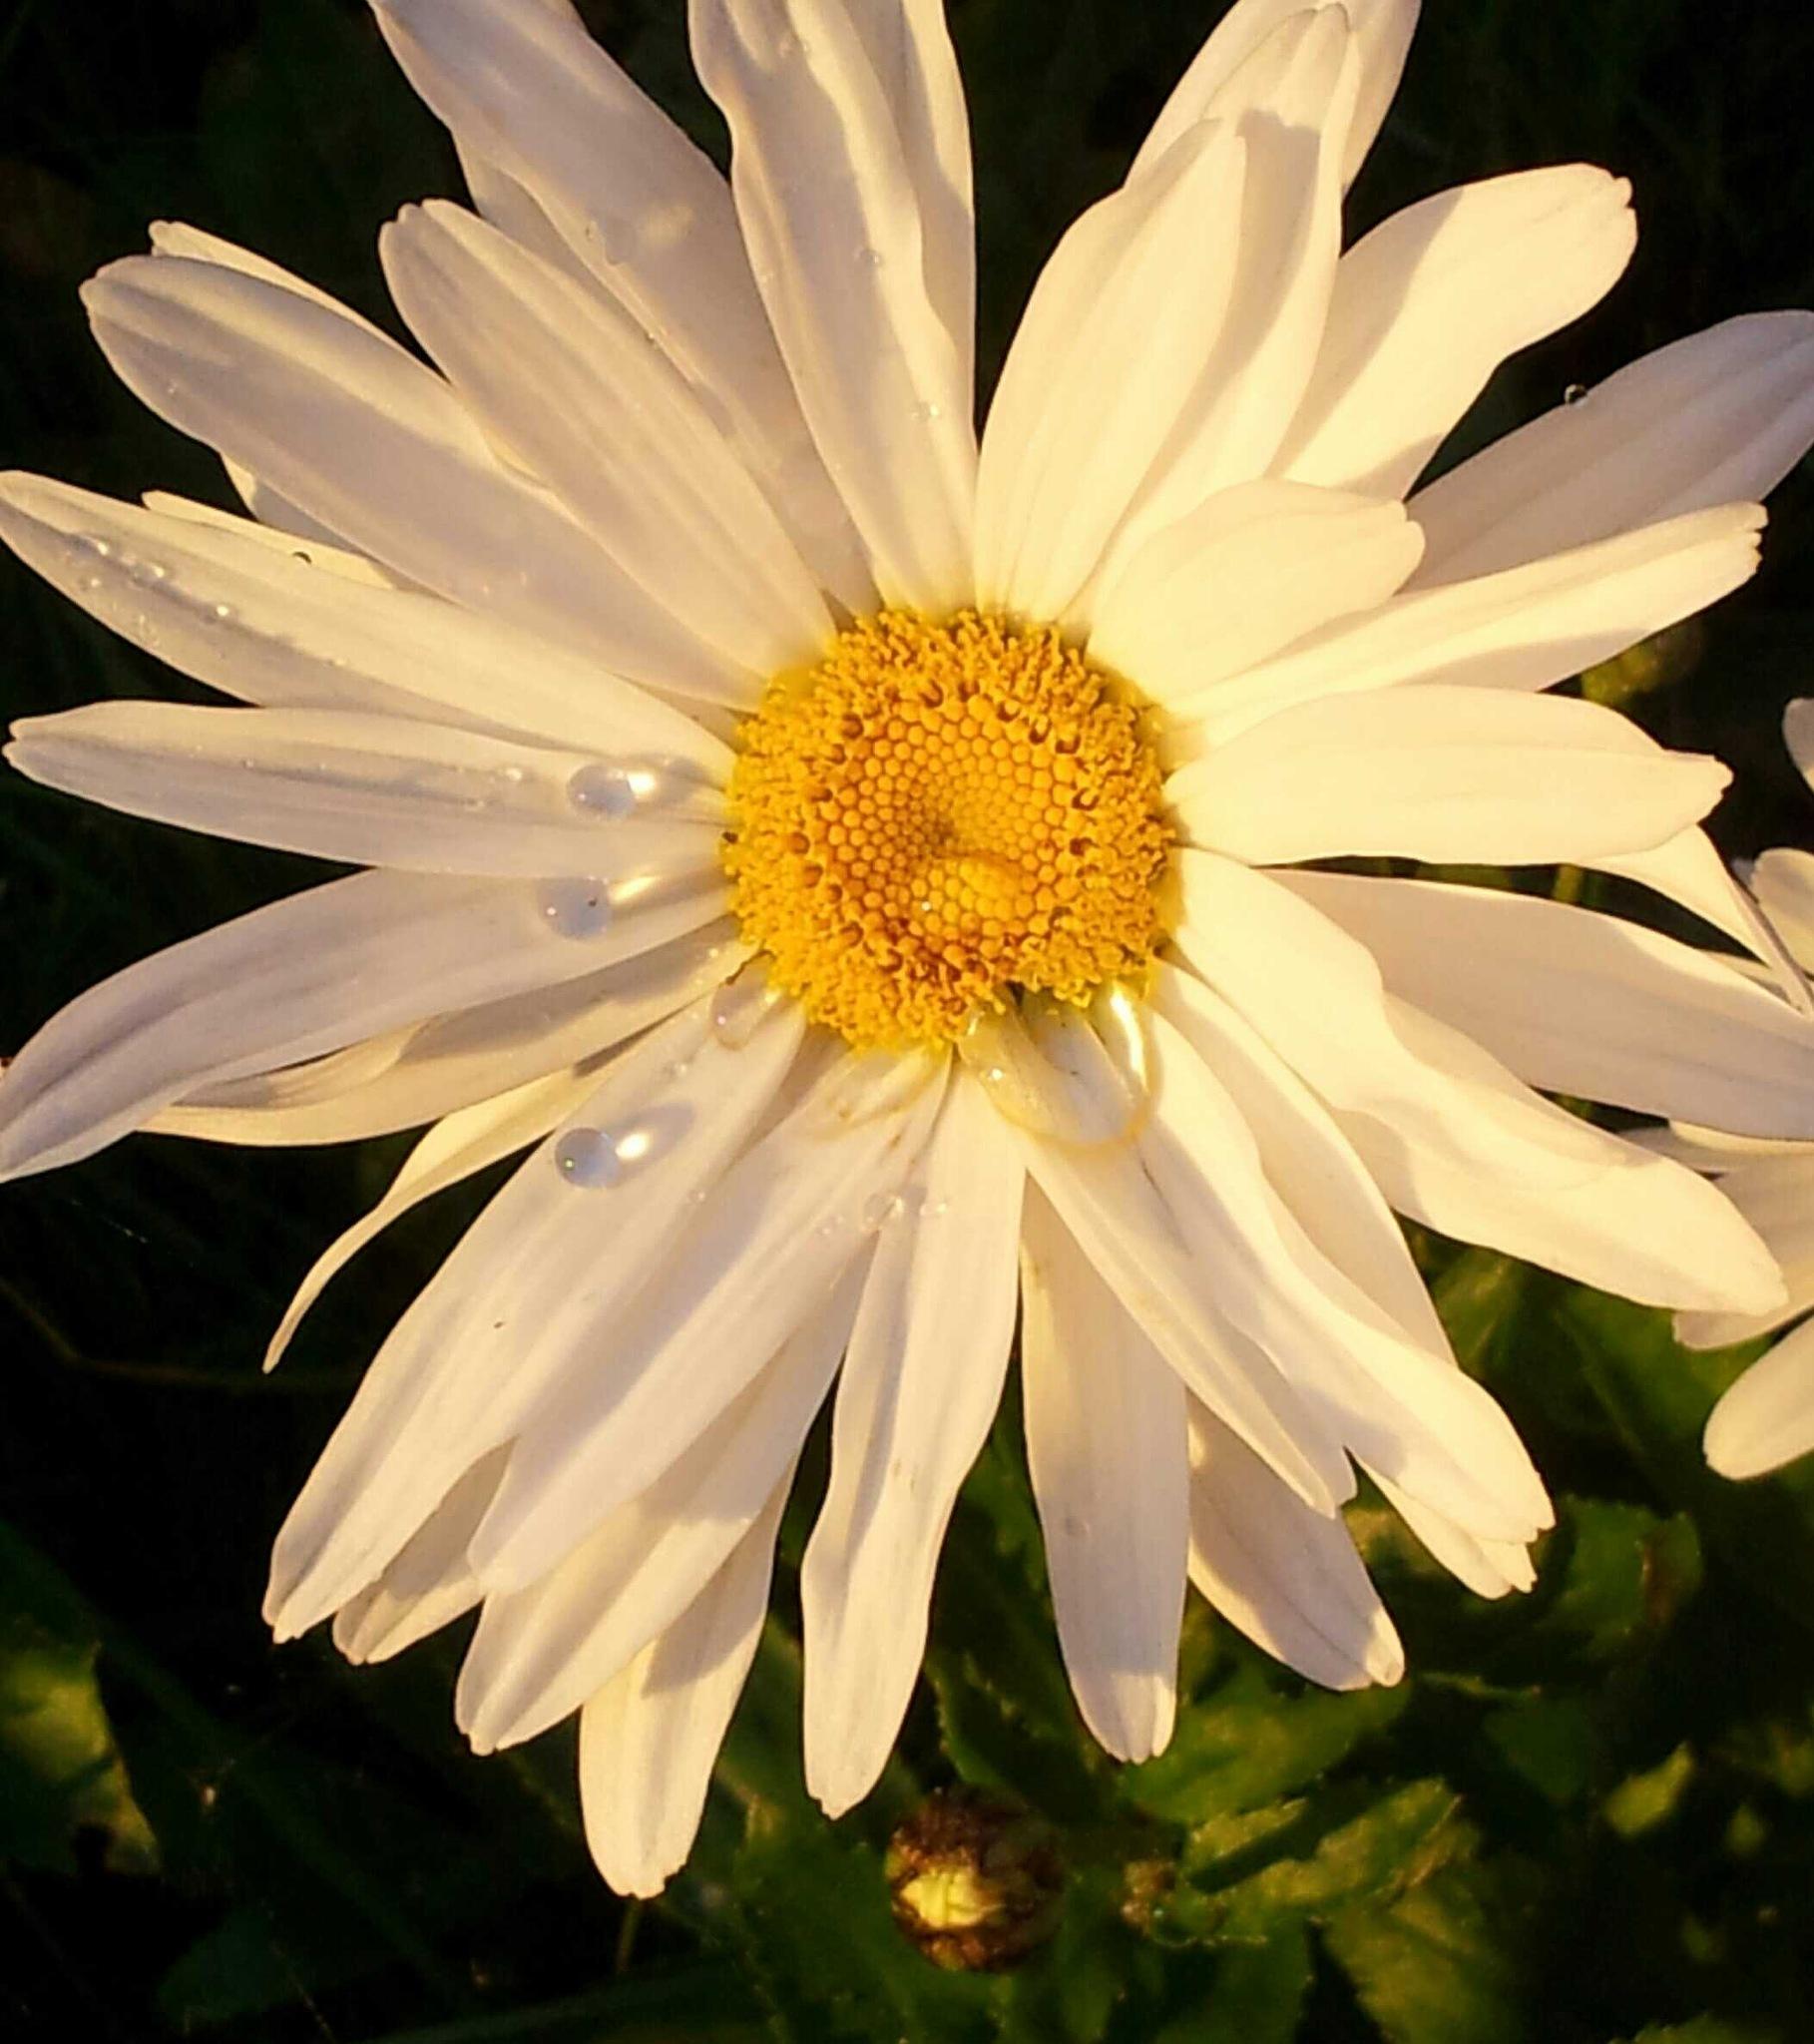 I like to photography flowers! ☺ by Monica